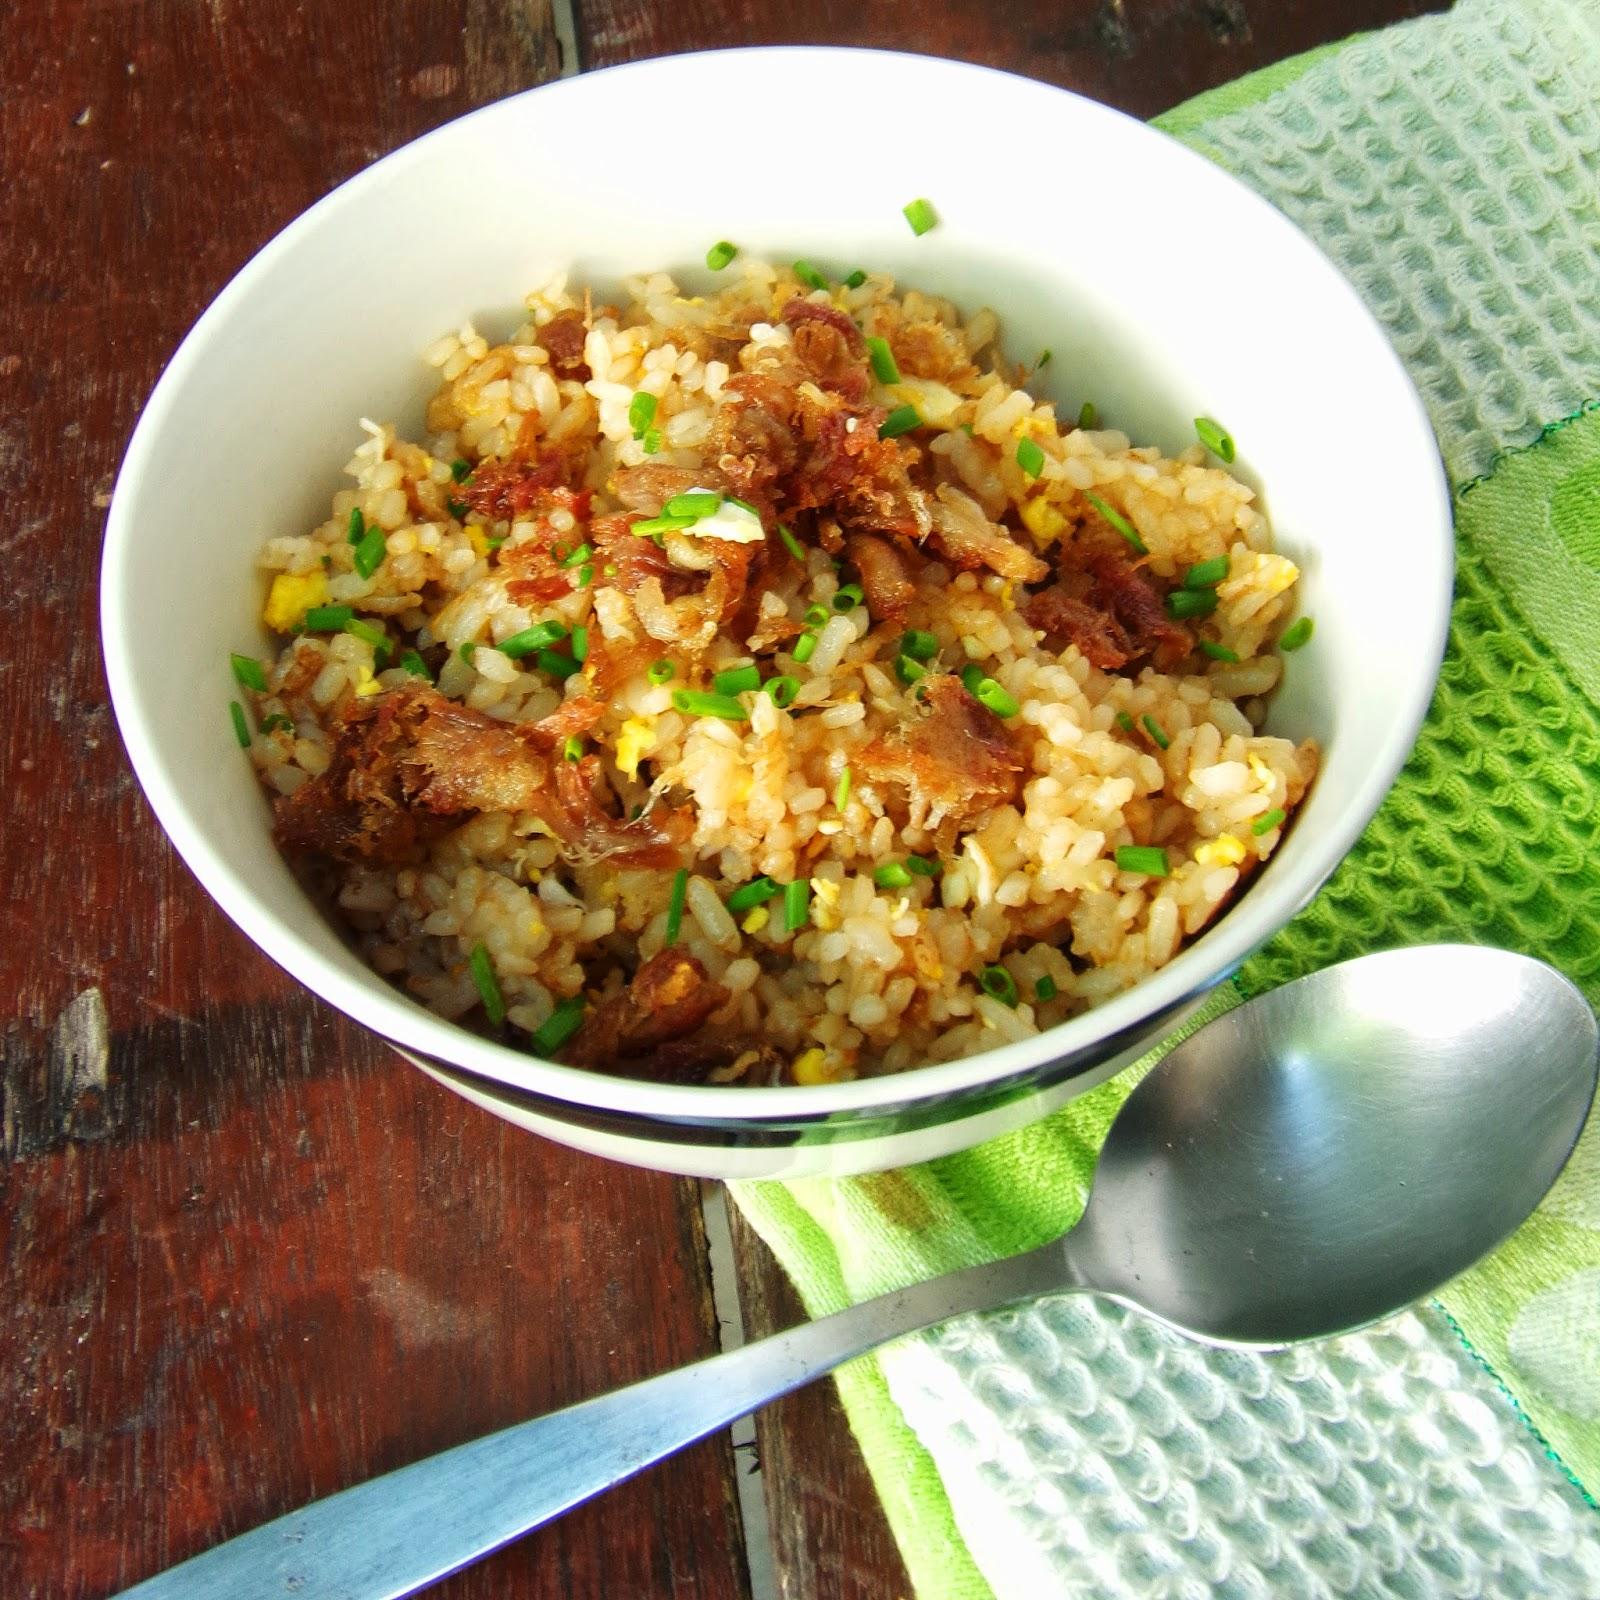 fried rice recipes, simple fried rice, recipe fried rice, pork fried rice